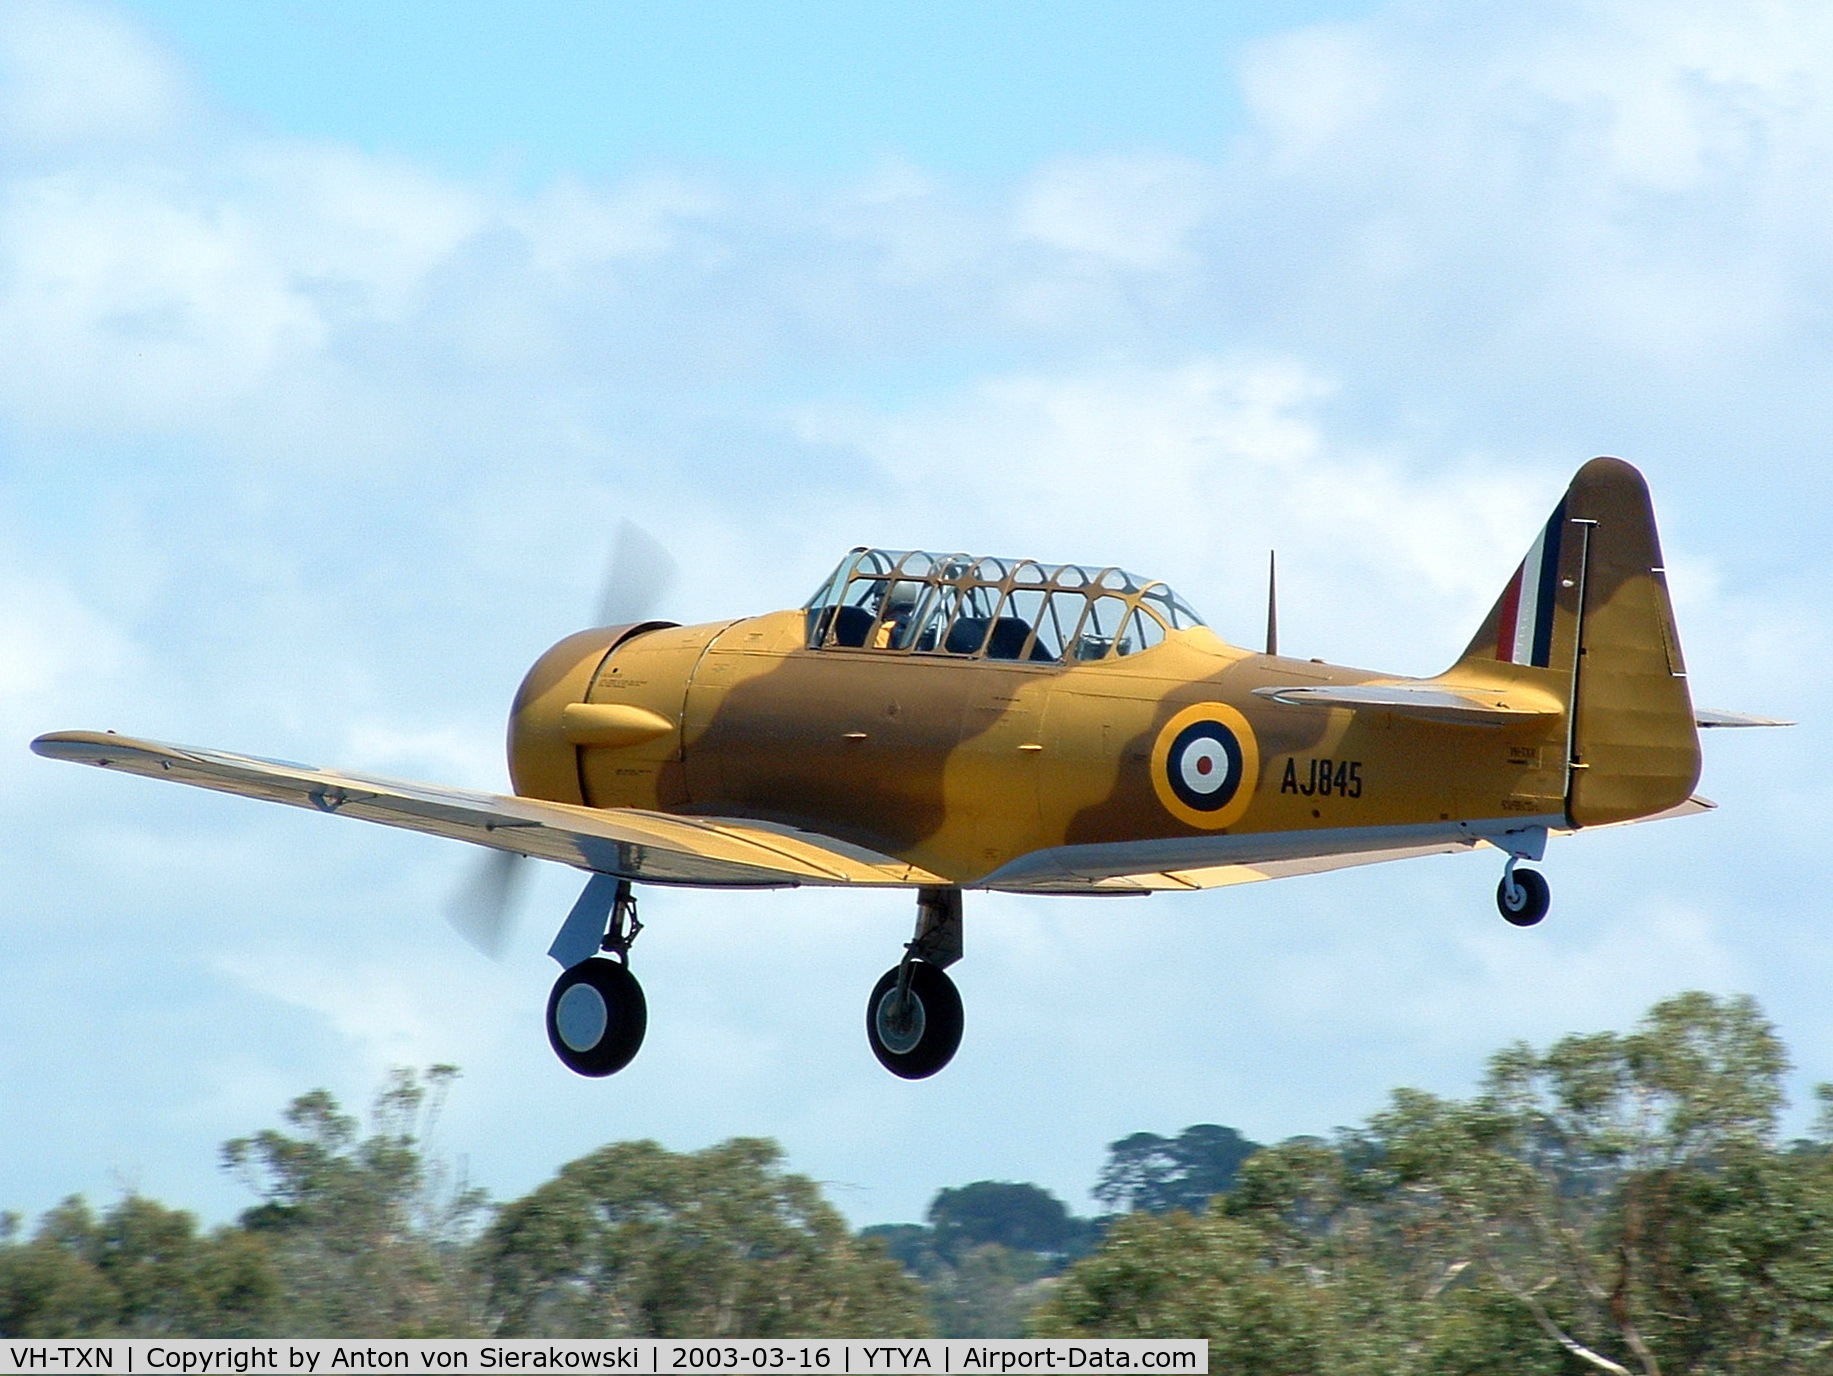 VH-TXN, 1943 Noorduyn AT-16 Harvard IIB C/N 14A-1106, VH-TXN @ YTYA Tyabb 2003 PAC Air Show